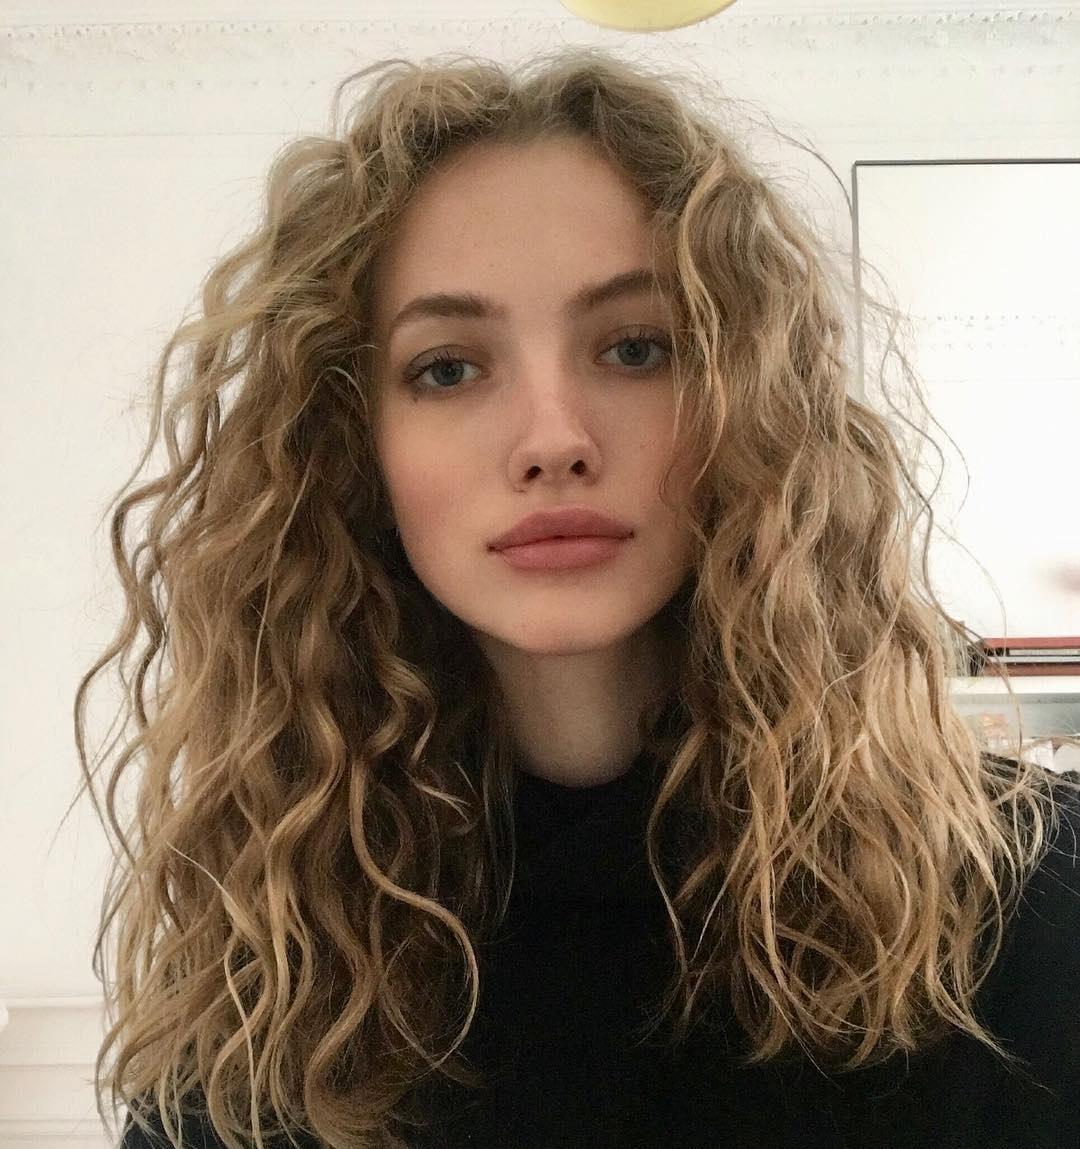 Tanya-Kizko-Wallpapers-Insta-Fit-Bio-3